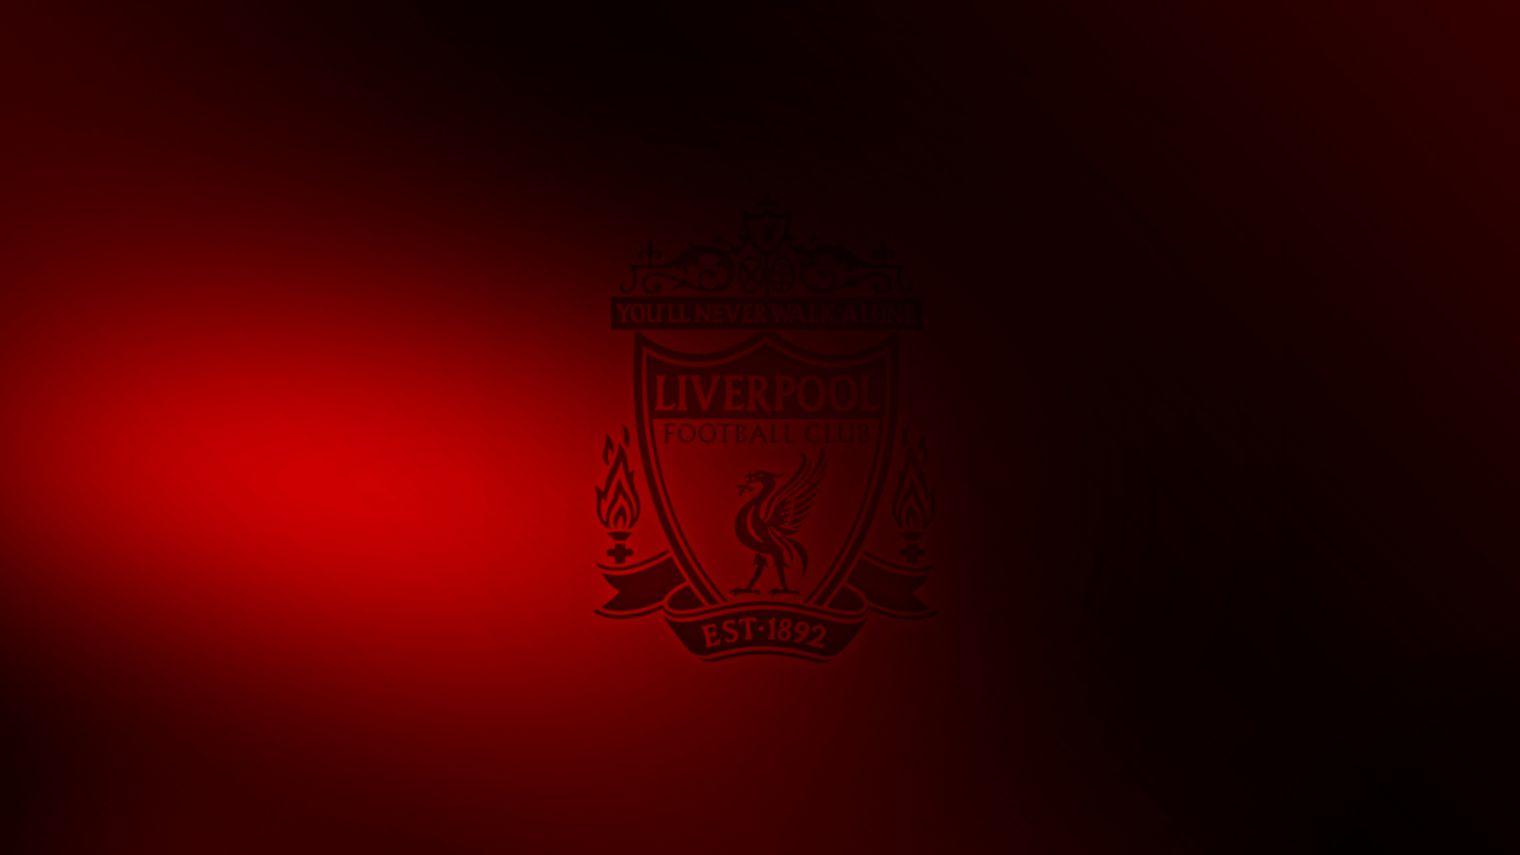 Liverpool Background Desktop Wallpaper Like Wallpapers